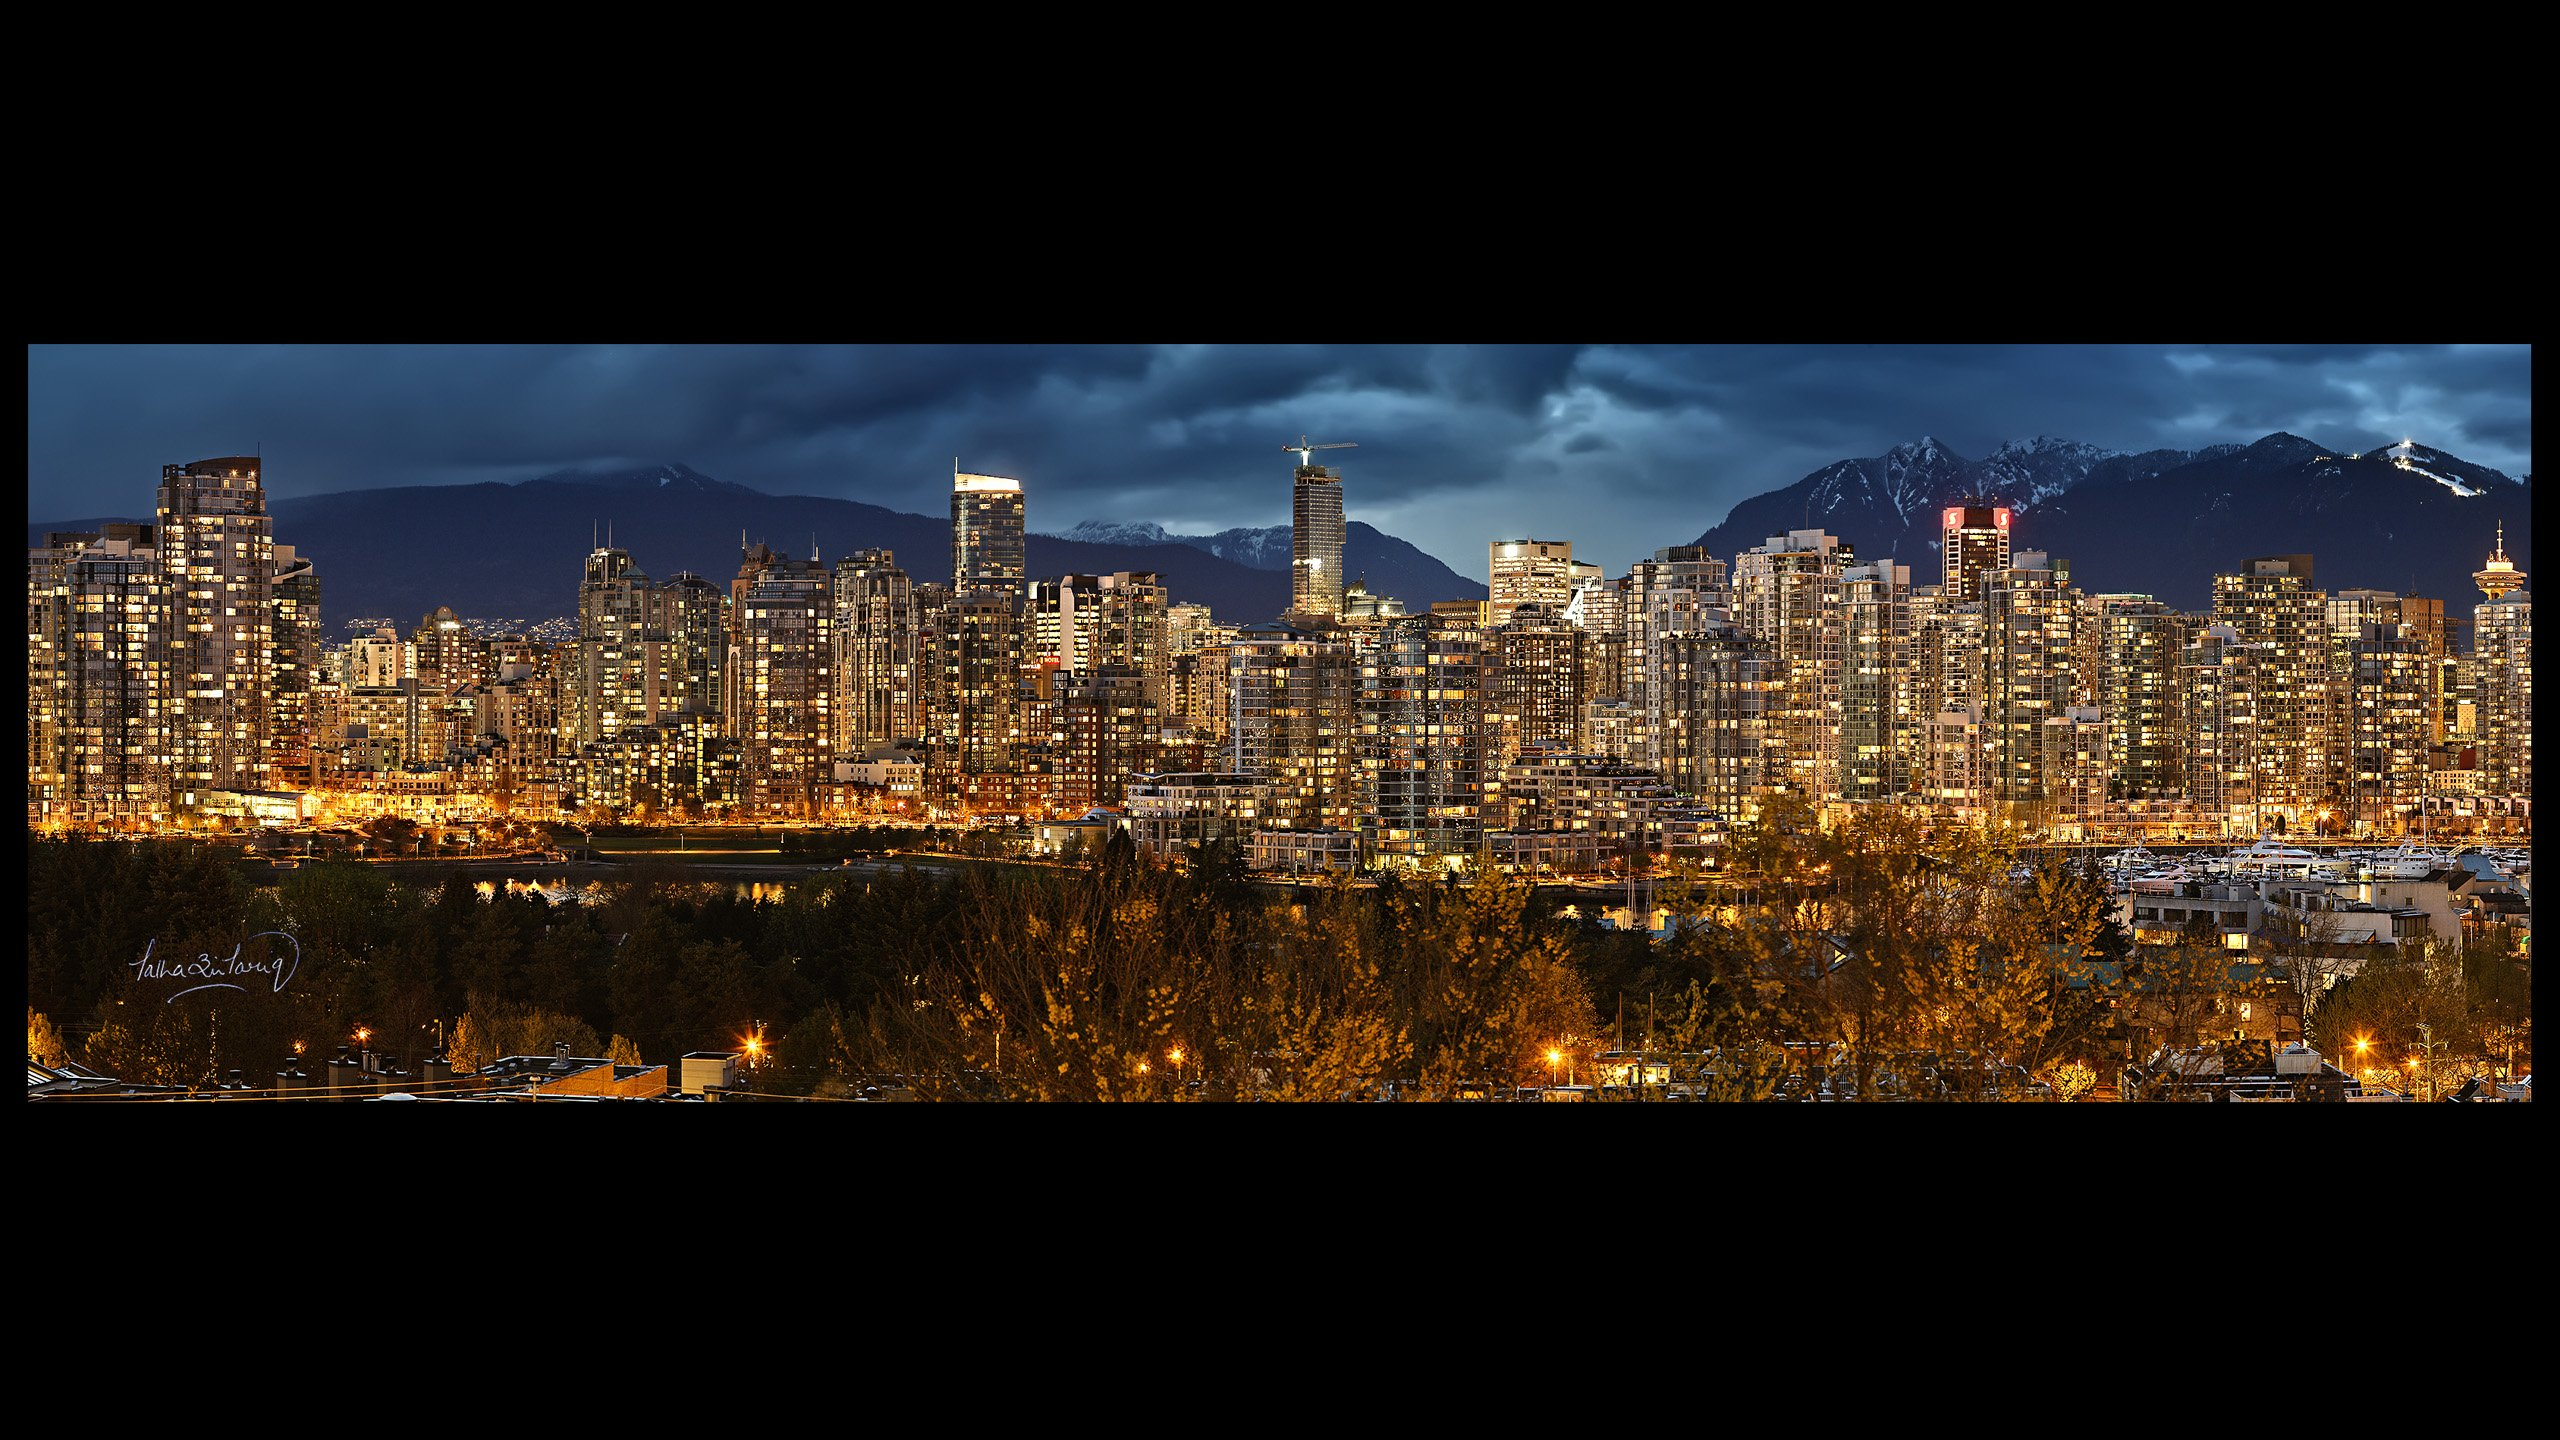 night wallpaper skyline city vancouver wallpapersjpg 2560x1440